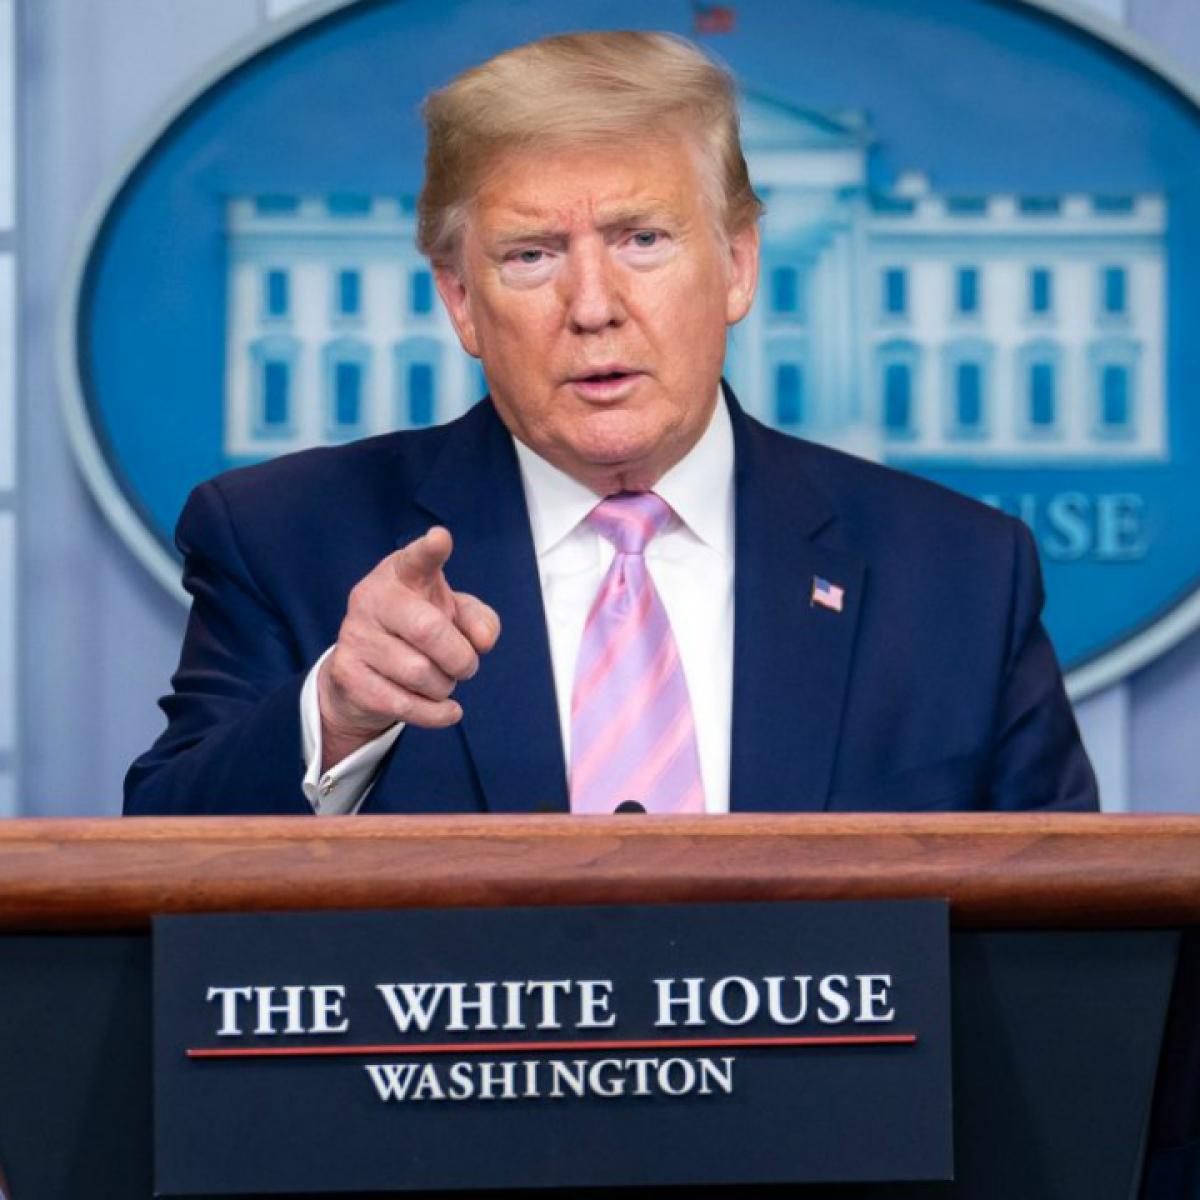 Working to make a decision on Tiktok: Donald Trump